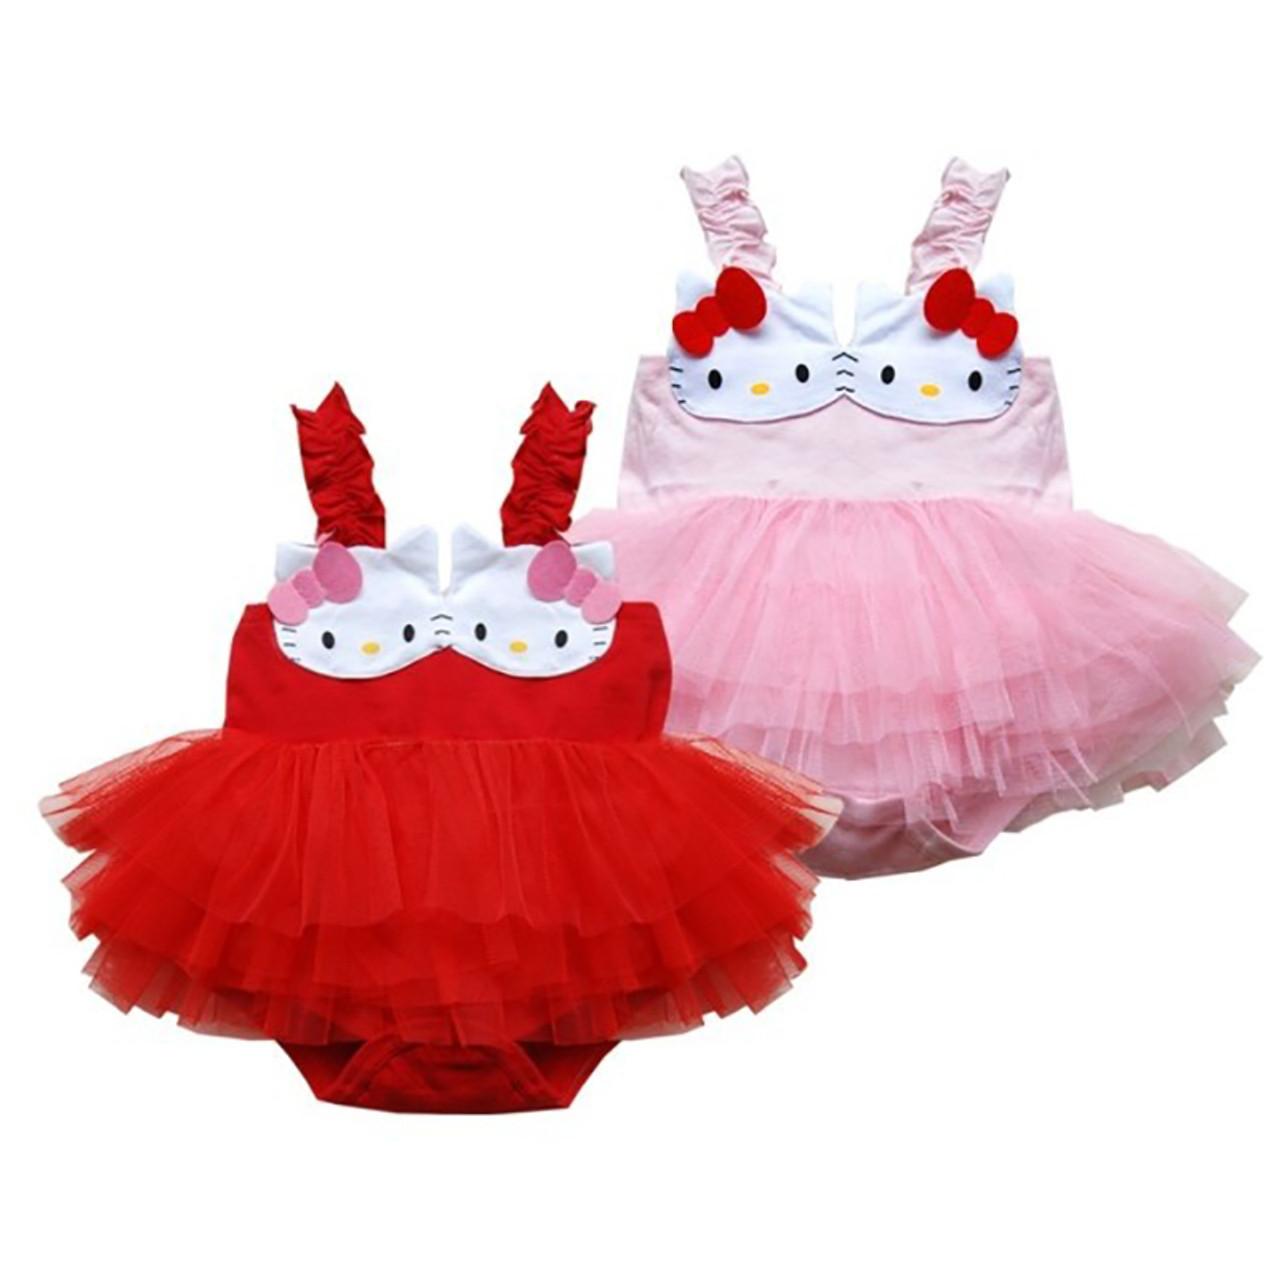 502a2d90d Baby Girl Clothes Newborn Baby Romper Dress Summer Bebe Infant Girls Hello  Kitty Lace Tutu Tank ...